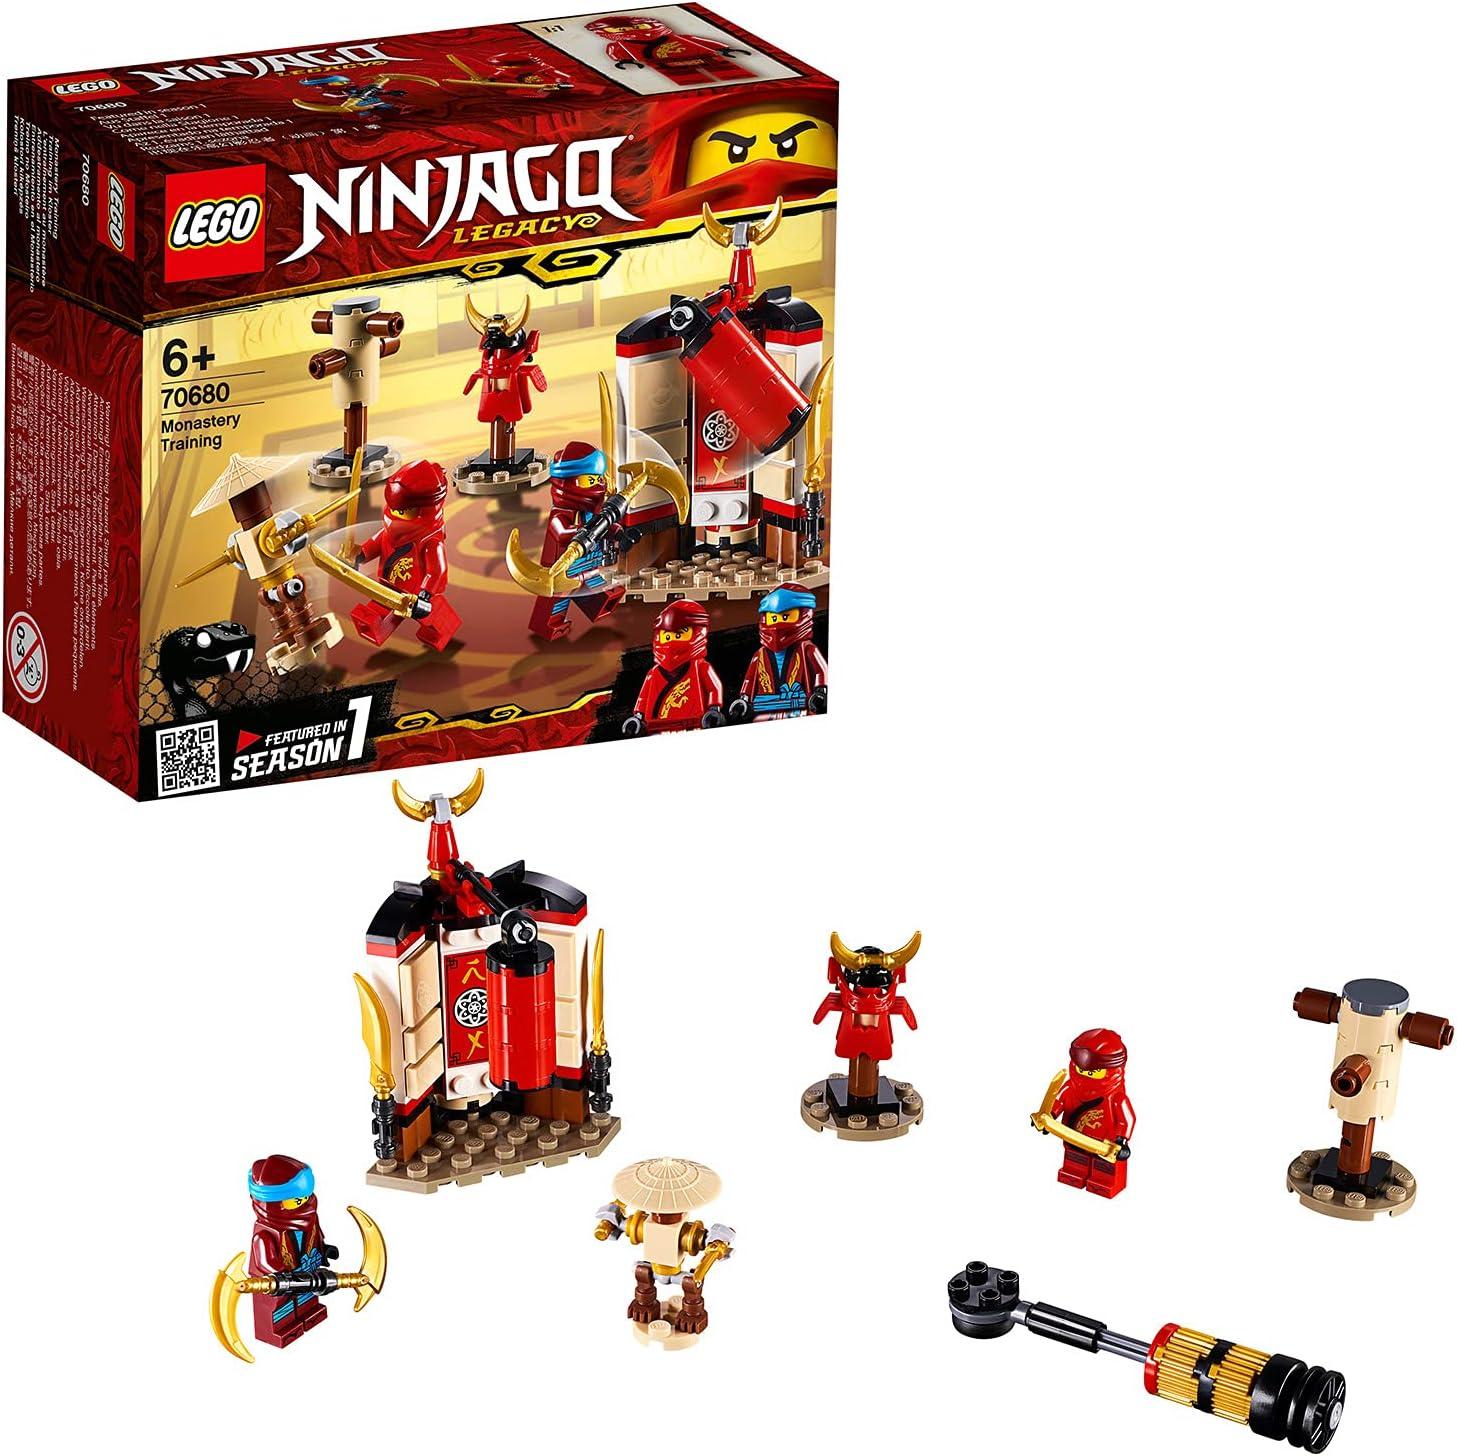 Lego 6259055 Lego Ninjago Lego Ninjago Kloostertraining - 70680, Multicolor